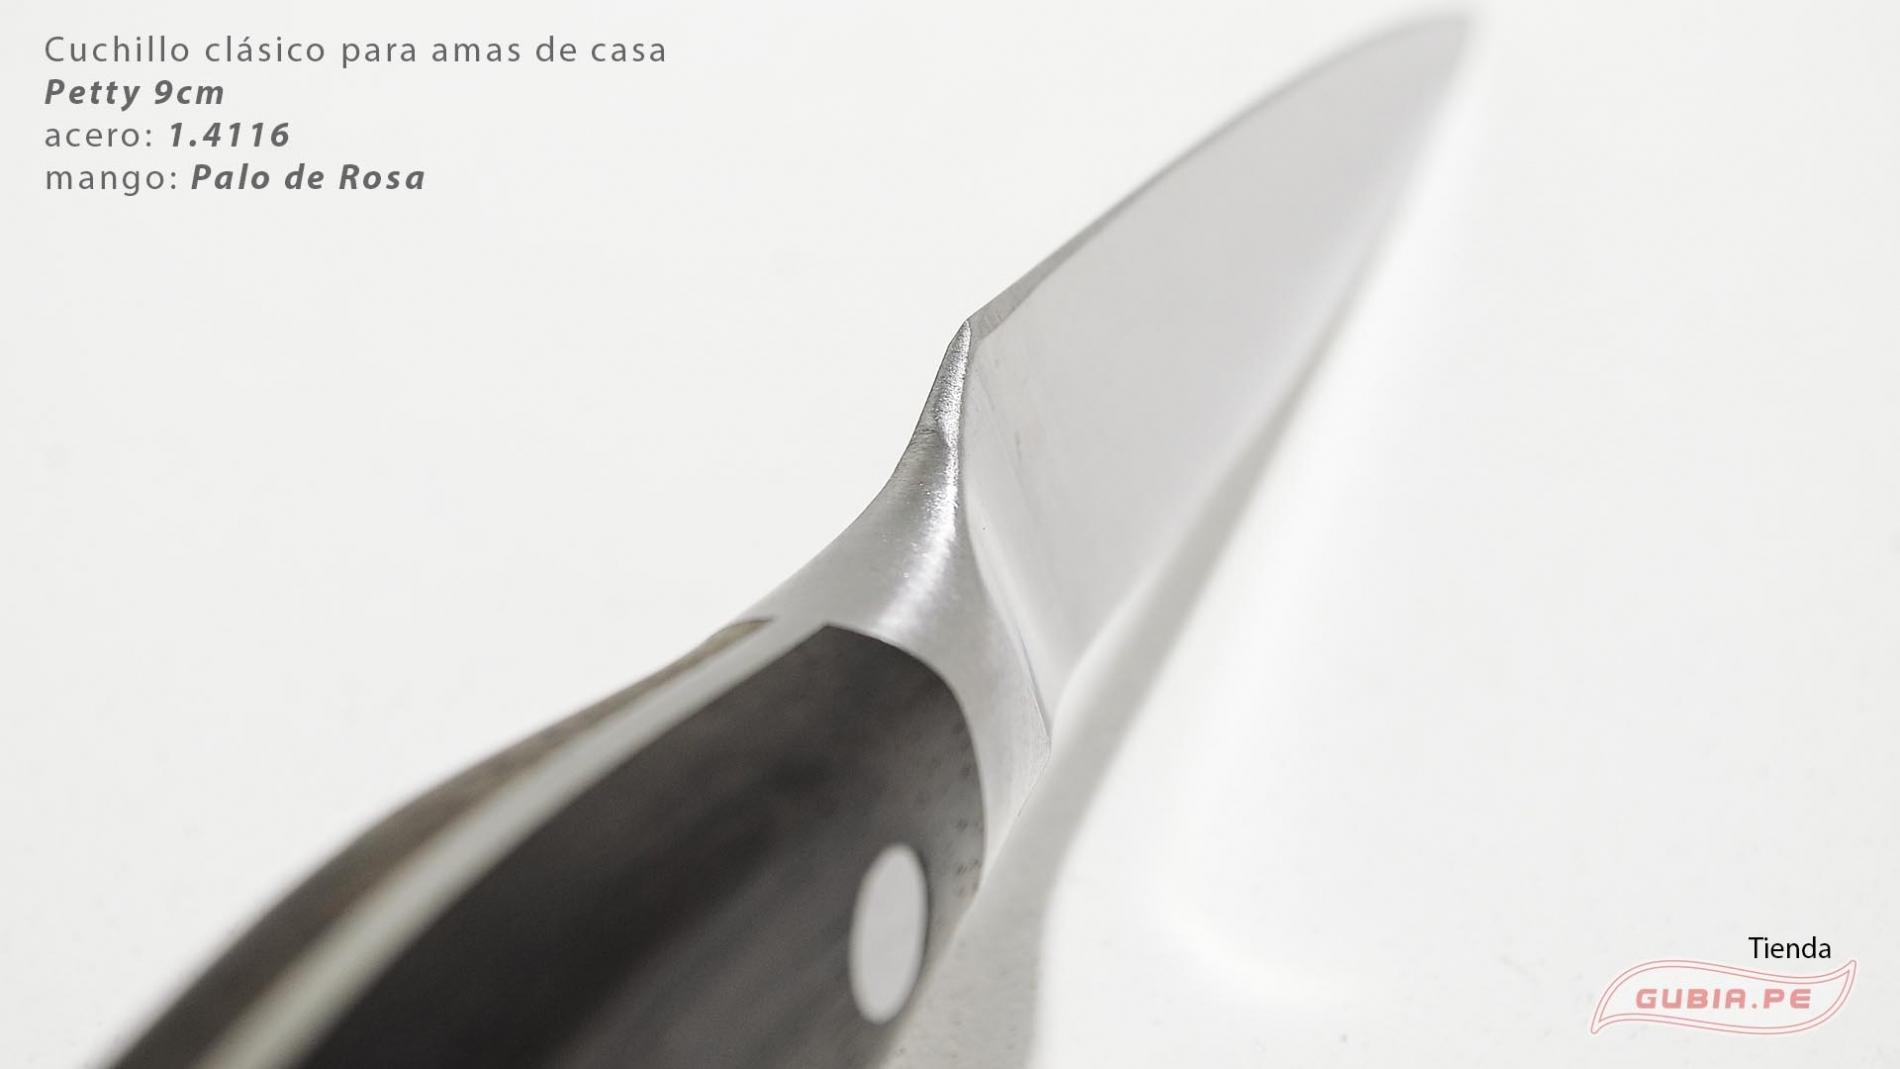 C1p9-Cuchillo Petty 9cm acero 1.4116 Palo de Rosa Clásico C1p9-max-3.